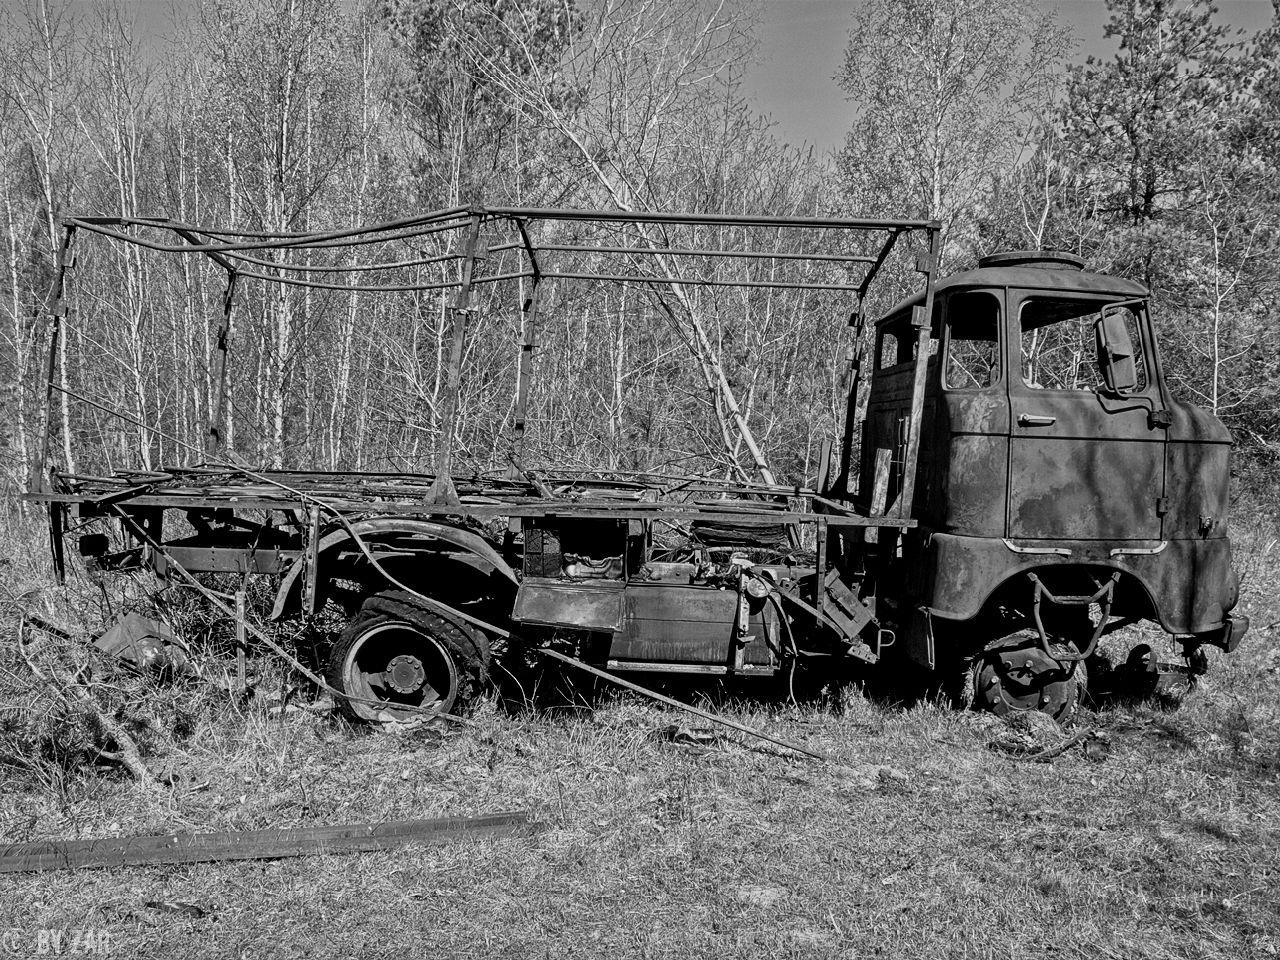 Autofriedutofriedhof-Falkenberg-copy-5